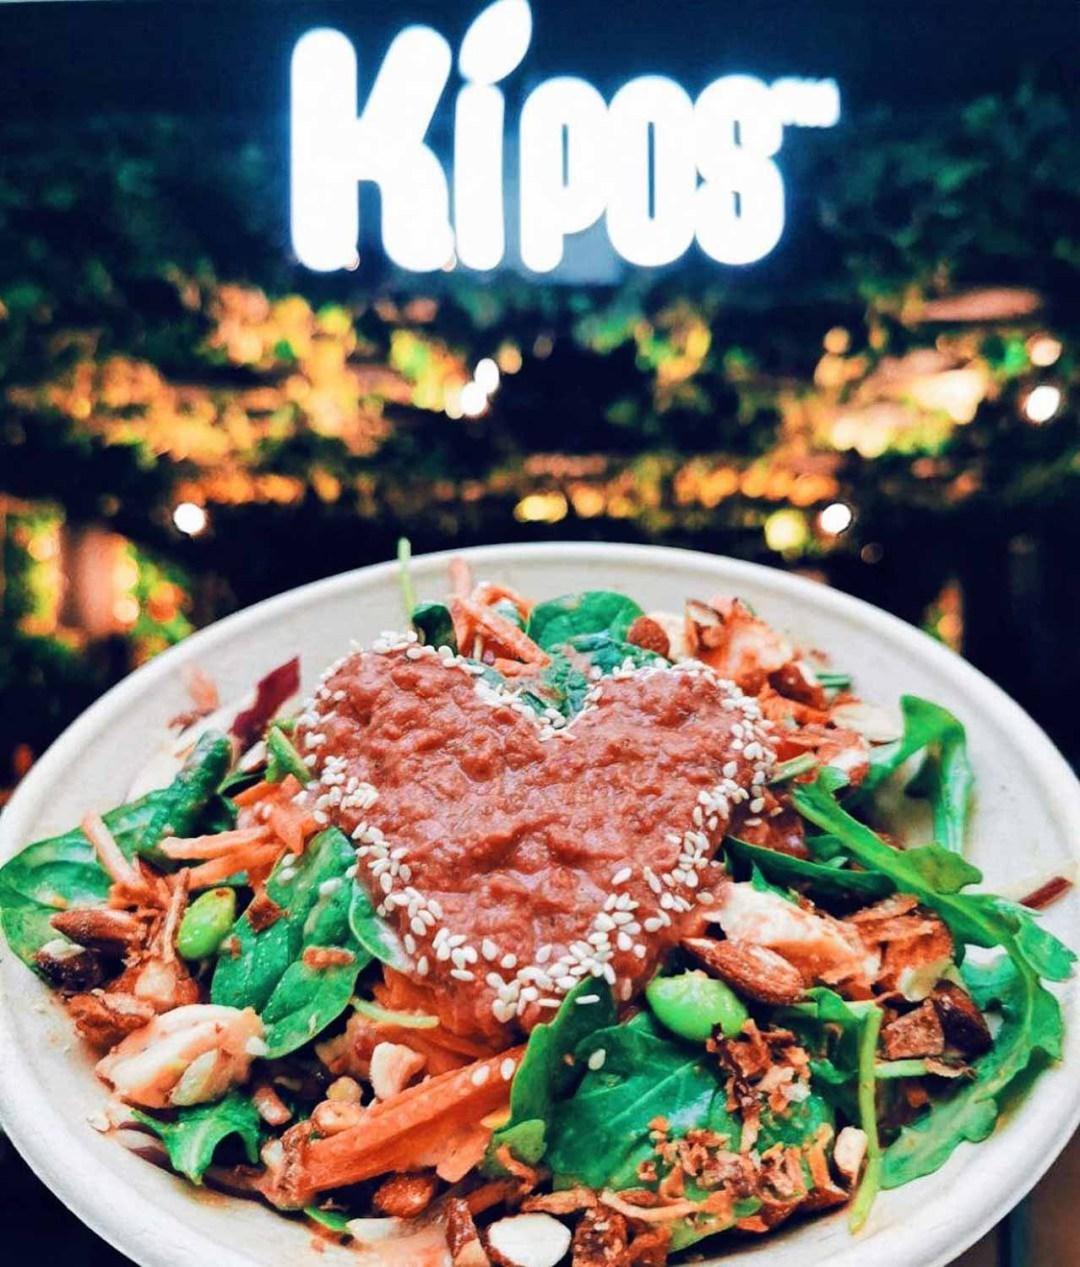 Healthy Food Delivery - Kipos gourmet